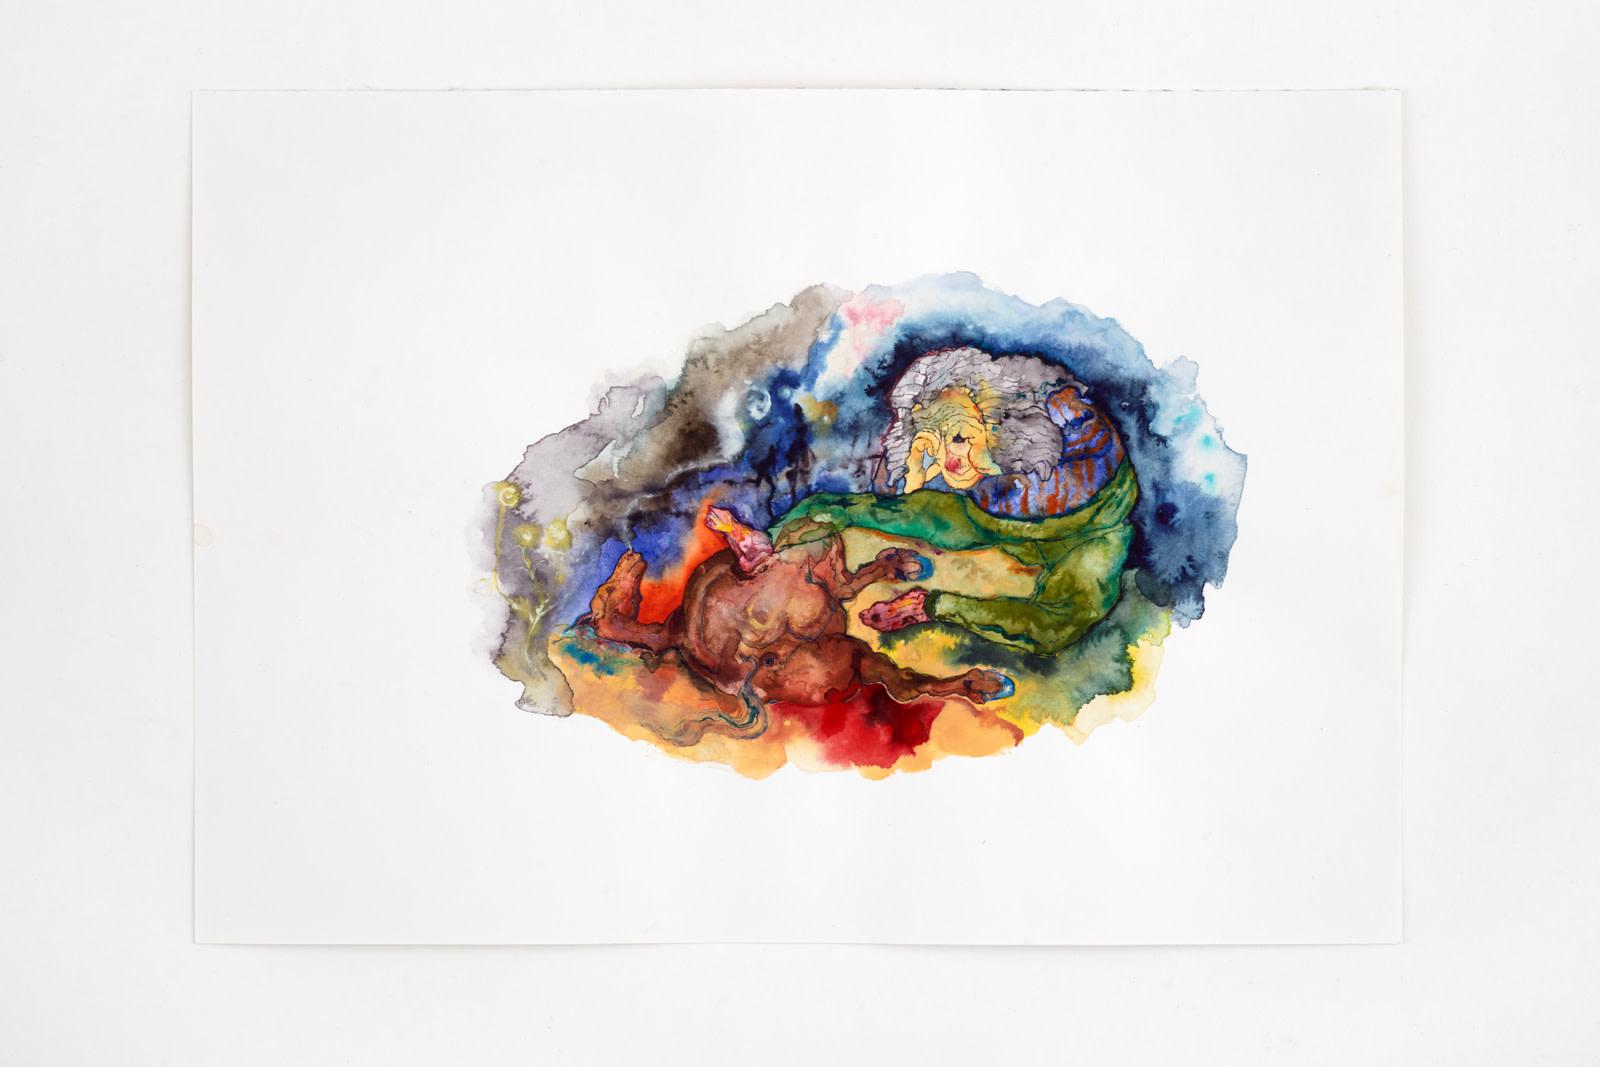 "<div class=""artwork_caption""><div class=""title""><em>Untitled</em>, 2020</div><div class=""medium"">watercolour on paper</div><div class=""dimensions"">site size: 30.4 x 45.4 cm / 12 x 17 ⅞ in<br />frame size: 34.1 x 46.4 x 2.5 cm / 13 ⅜ x 18 ¼ x 1 in</div></div><div class=""link""><span class=""website_contact_form"" data-contact-form-details=""Untitled , 2020  watercolour on paper  site size: 30.4 x 45.4 cm / 12 x 17 ⅞ in frame size: 34.1 x 46.4 x 2.5 cm / 13 ⅜ x 18 ¼ x 1 in"" data-contact-form-image=""https://artlogic-res.cloudinary.com/w_200,h_200,c_fill,f_auto,fl_lossy/ws-sadiecoles/usr/exhibitions/images/exhibitions/829/hq24-hm16785d-untitled_unframed.jpeg"">Enquire</span></div>"